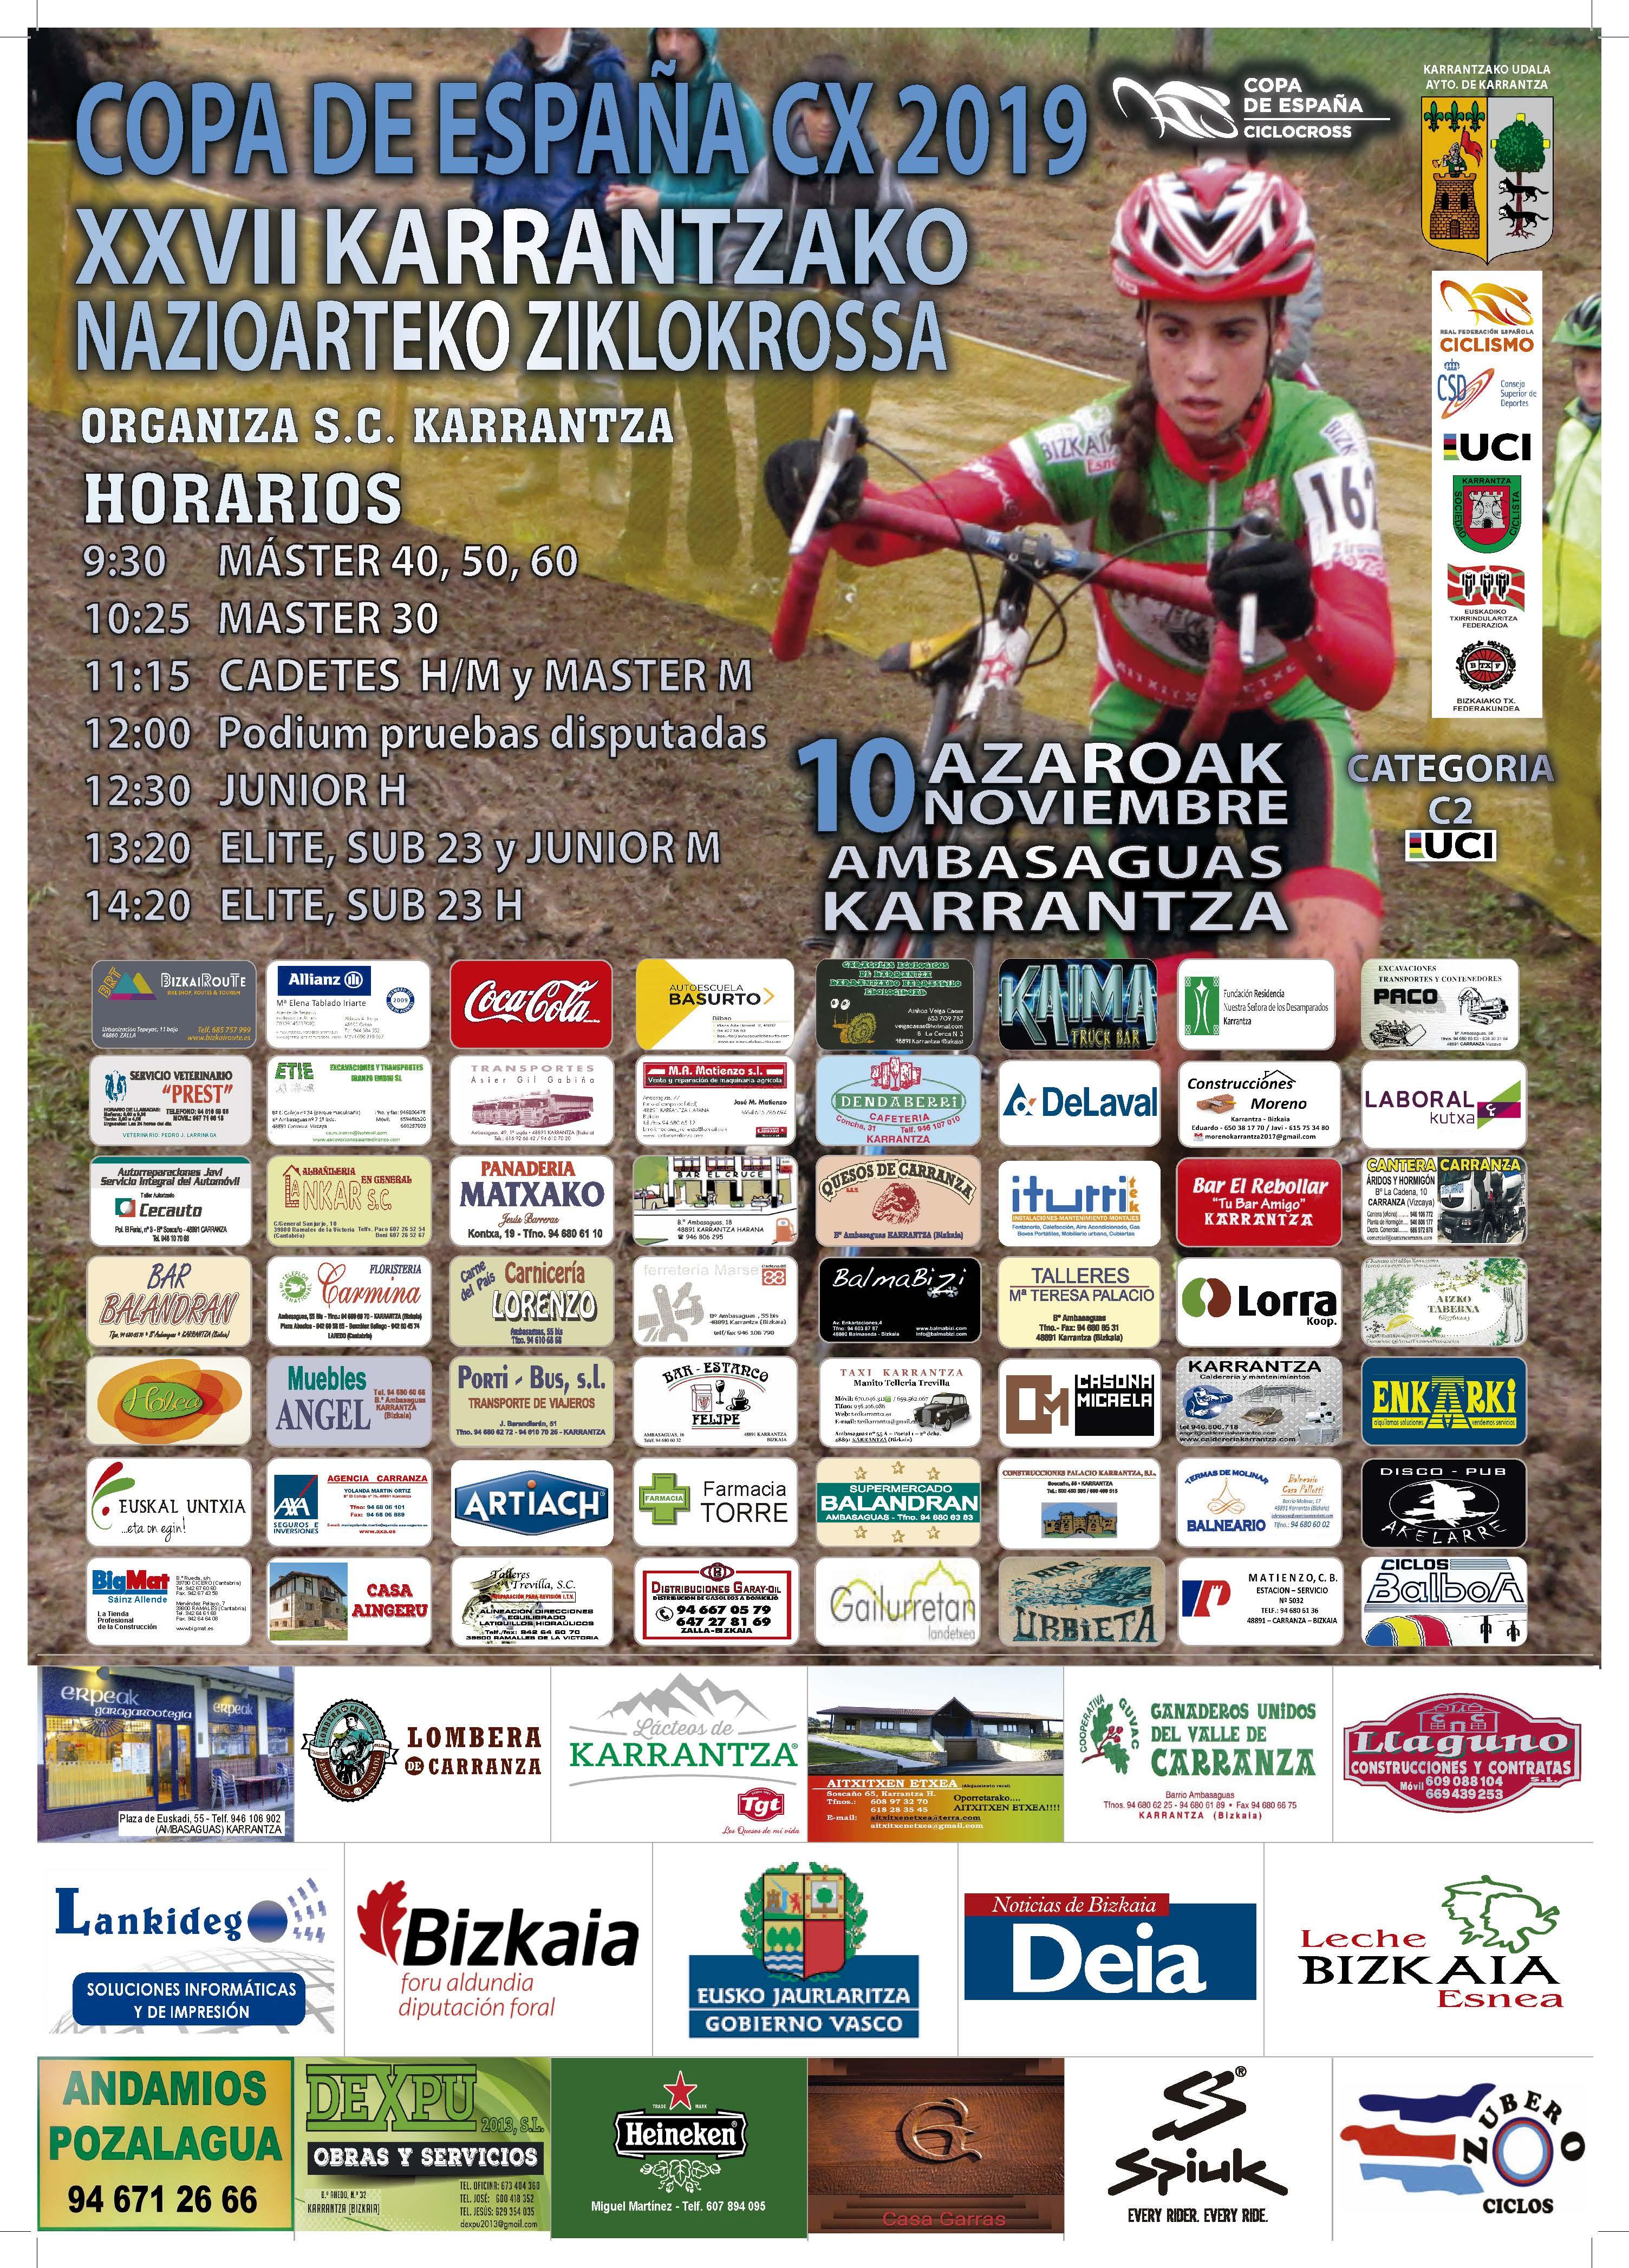 XXVII Ciclocross Internacional de Karrantza 2019